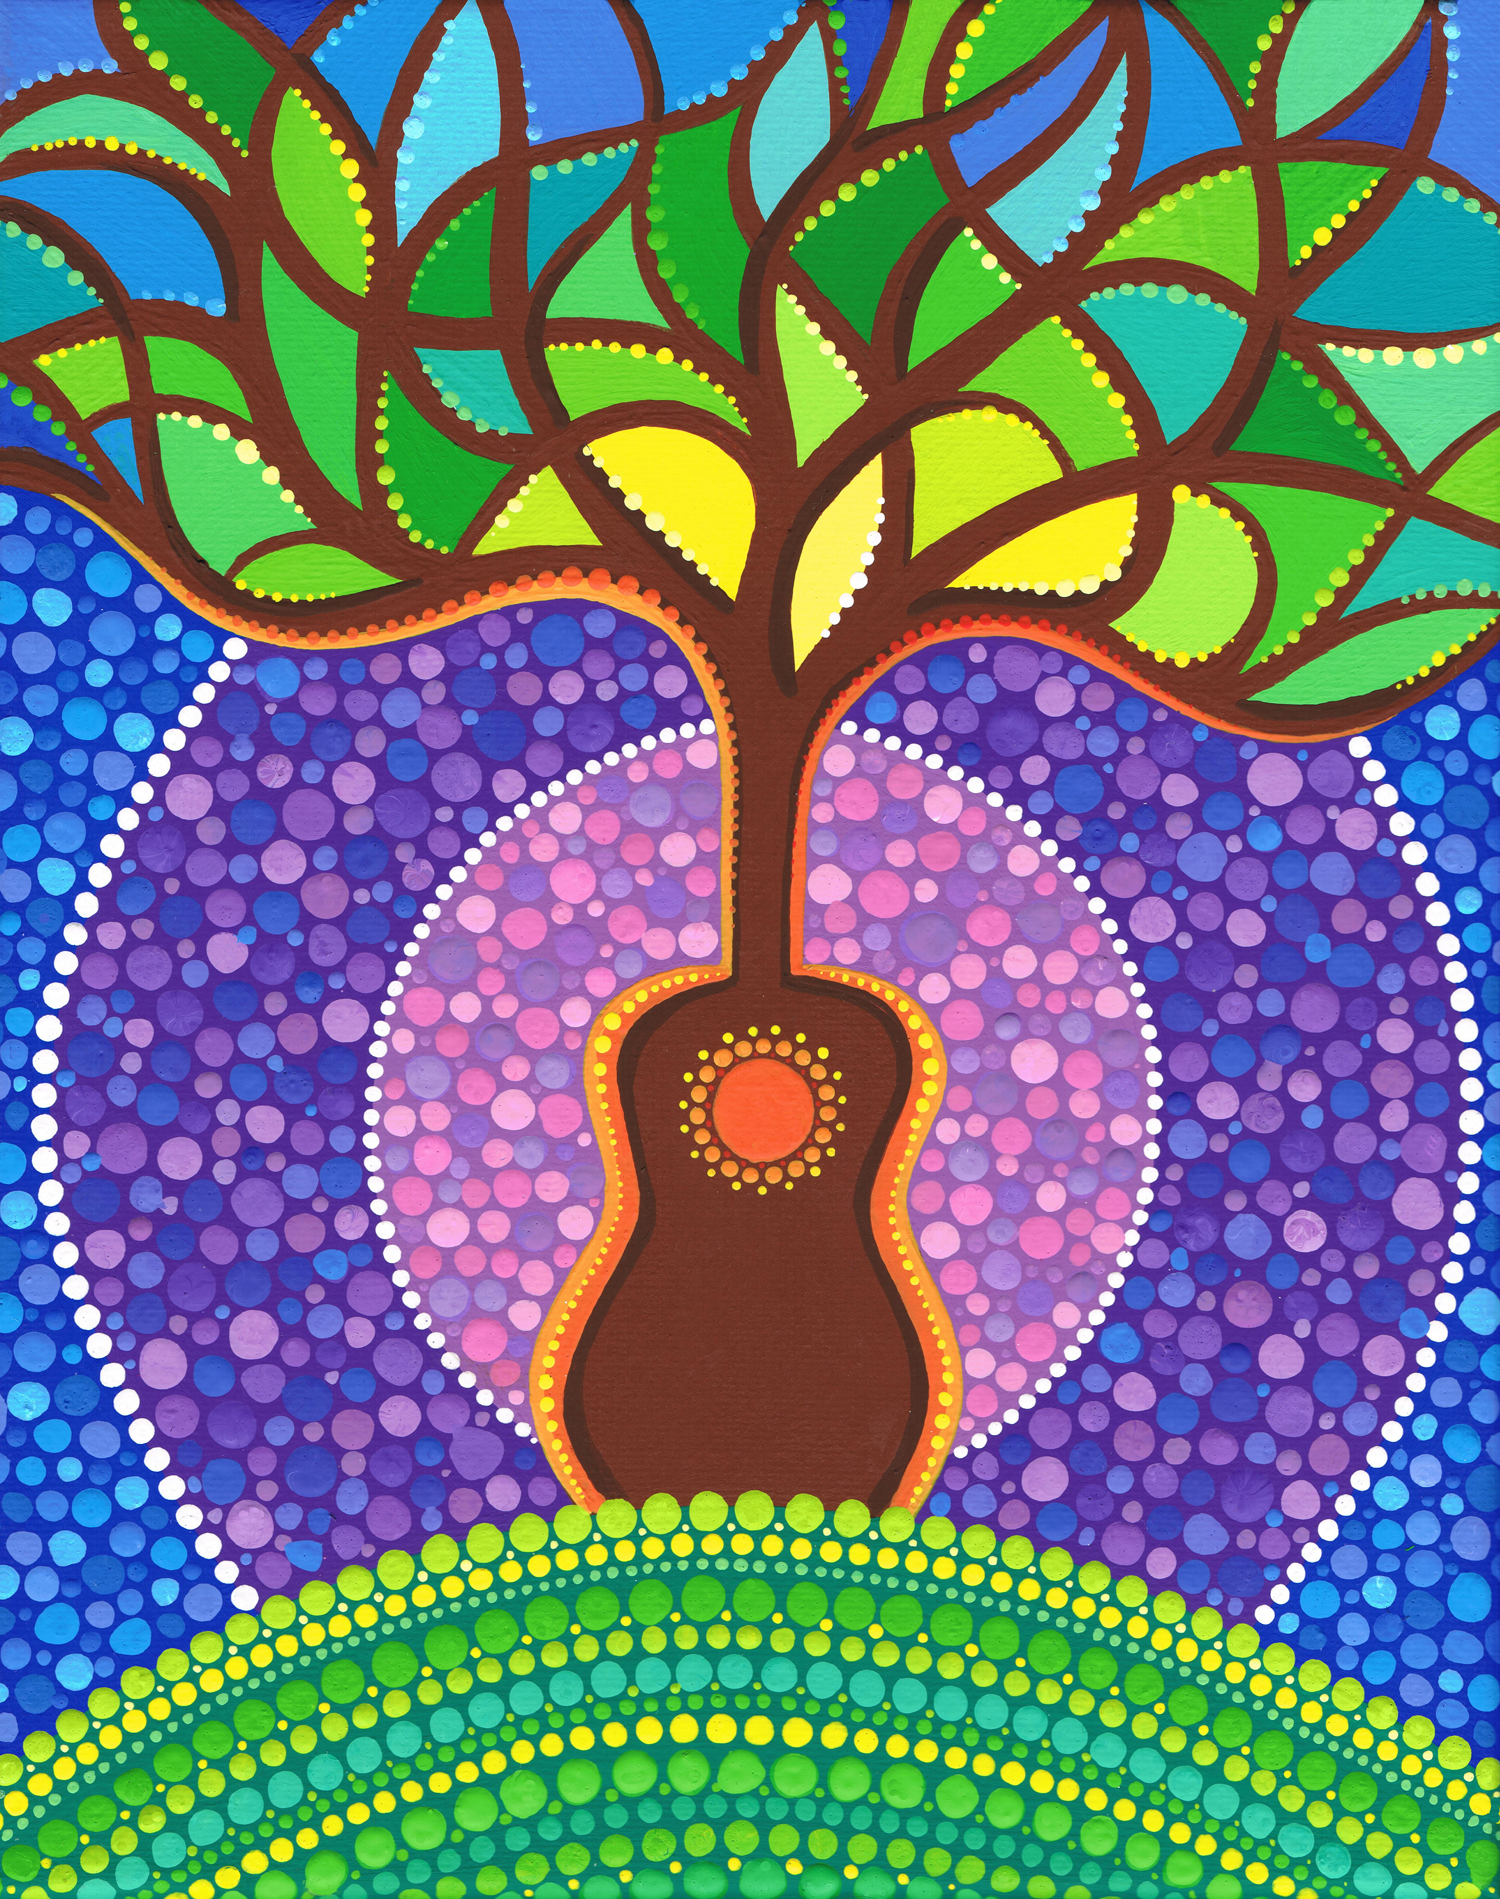 Guitar Harmonic Energy